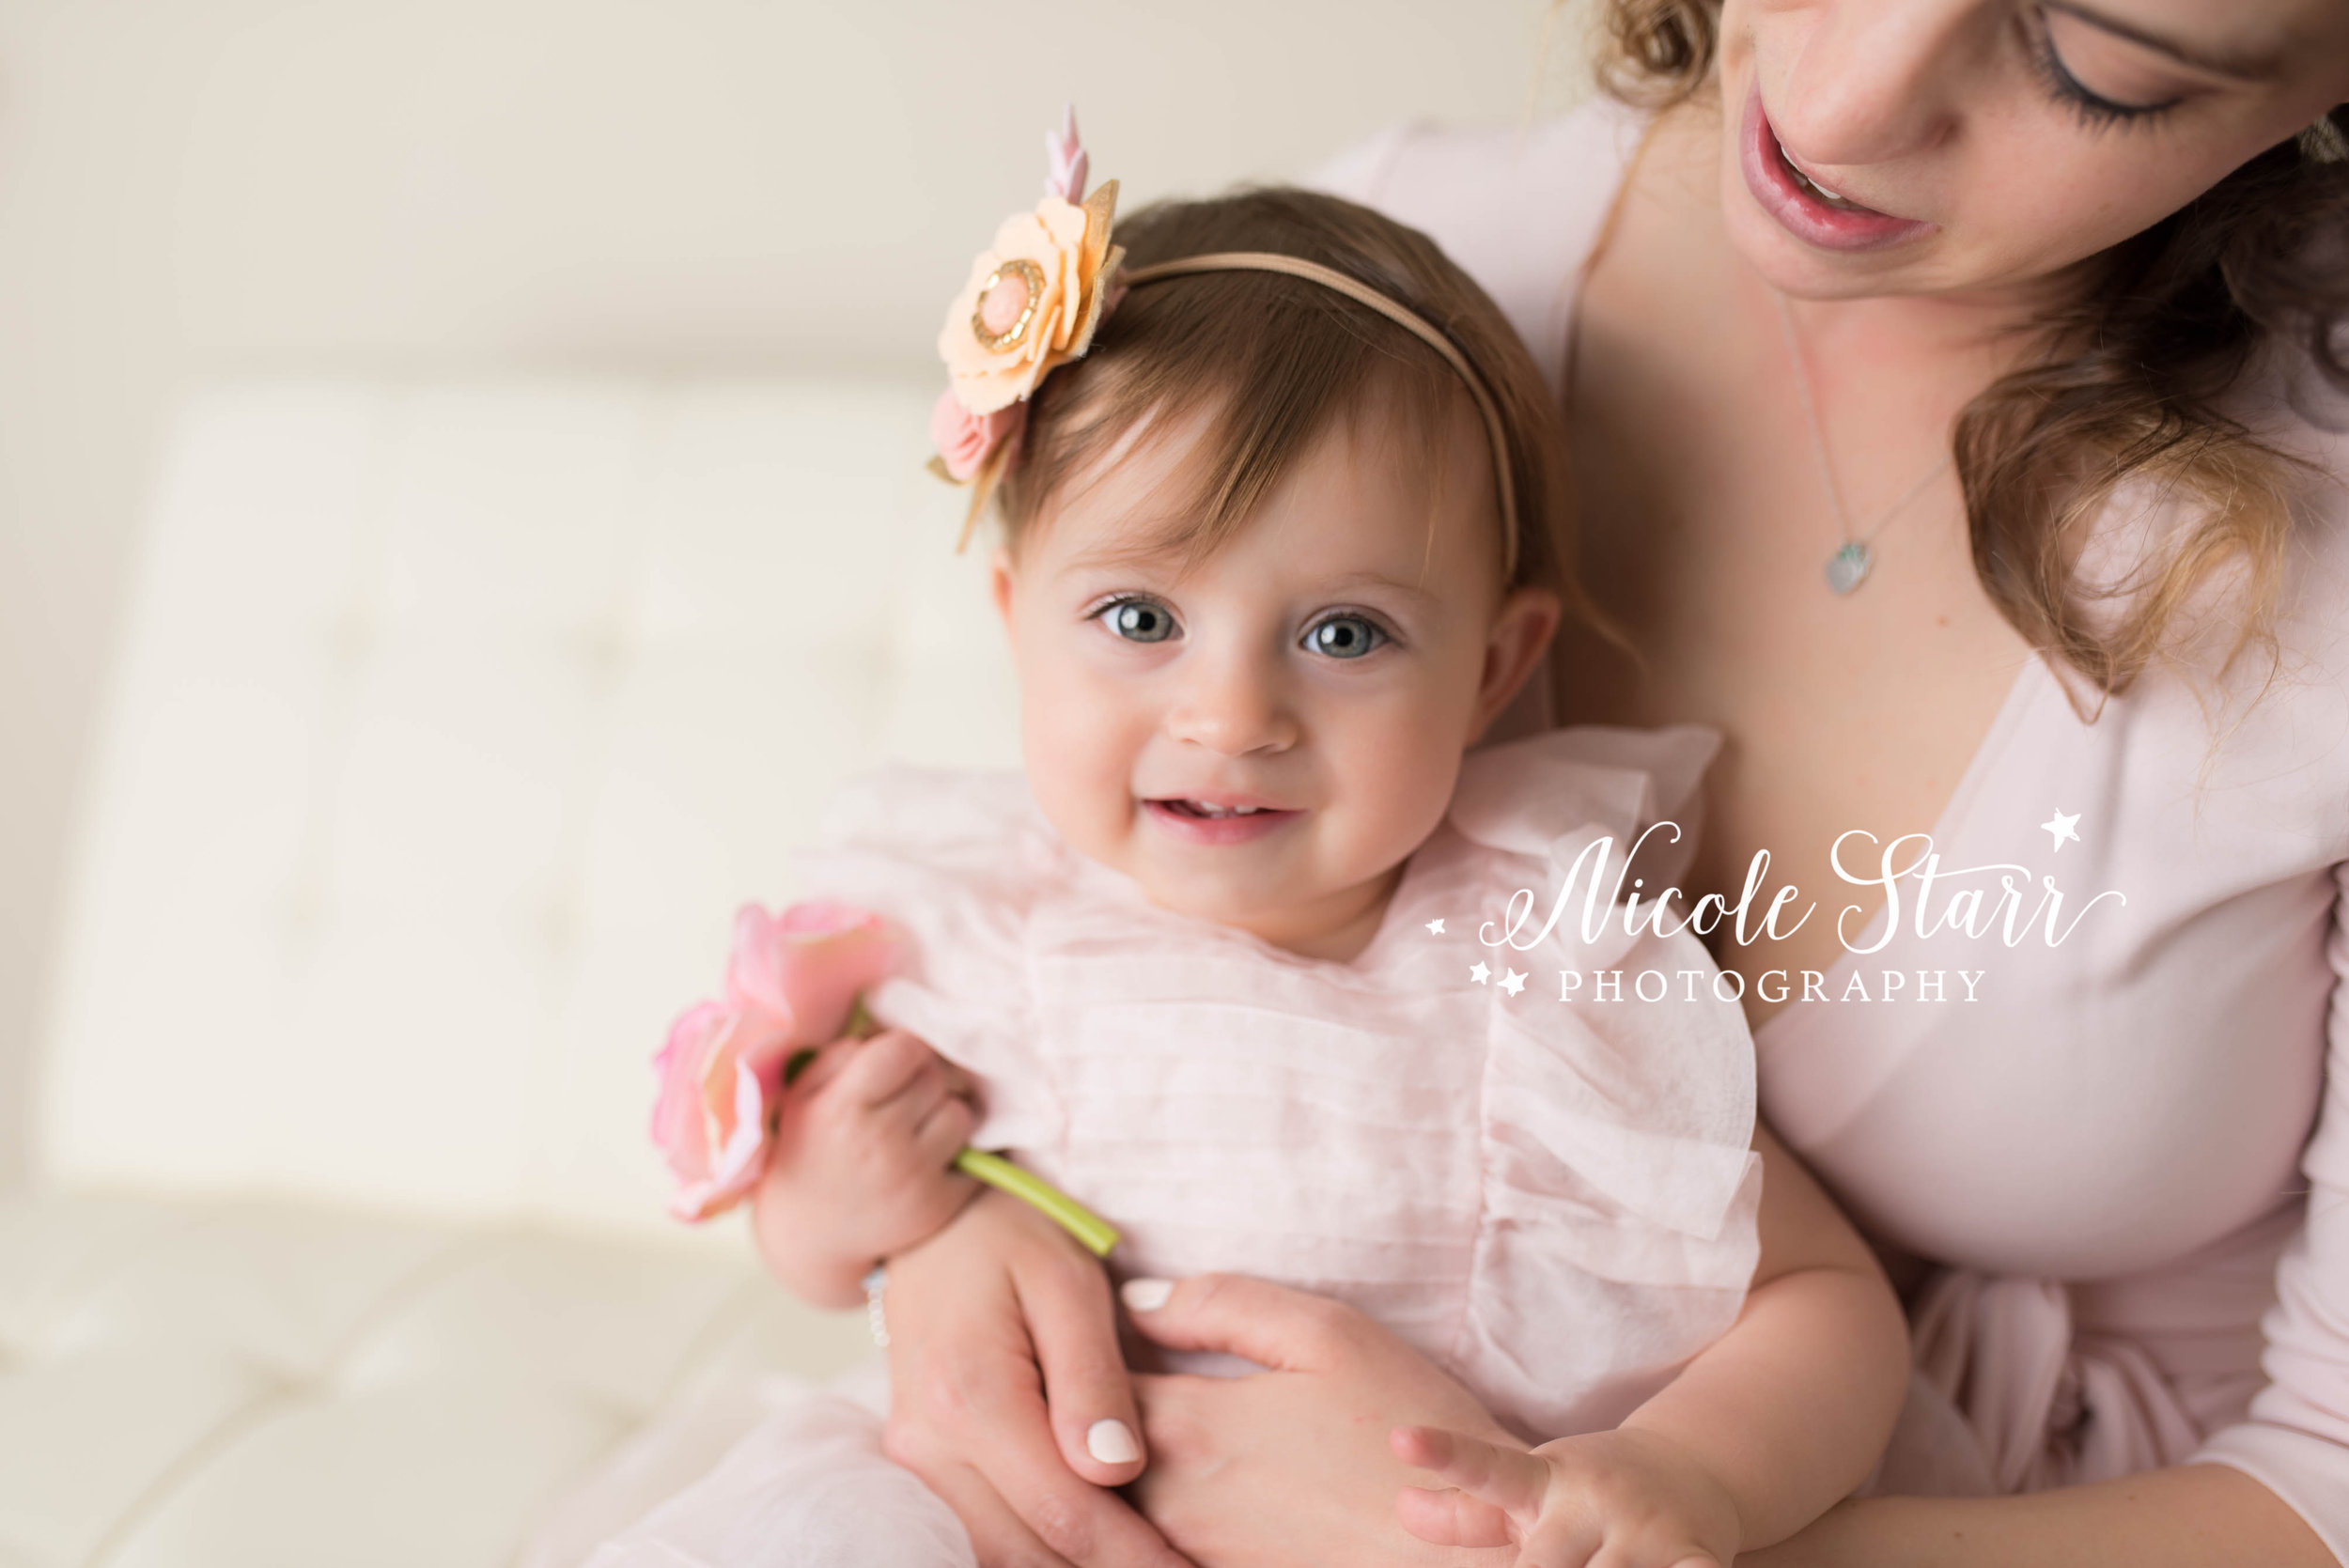 Nicole Starr Photography | Motherhood Photographer | Saratoga Springs NY Photographer | Albany NY Family Photographer | Boston Family Photographer